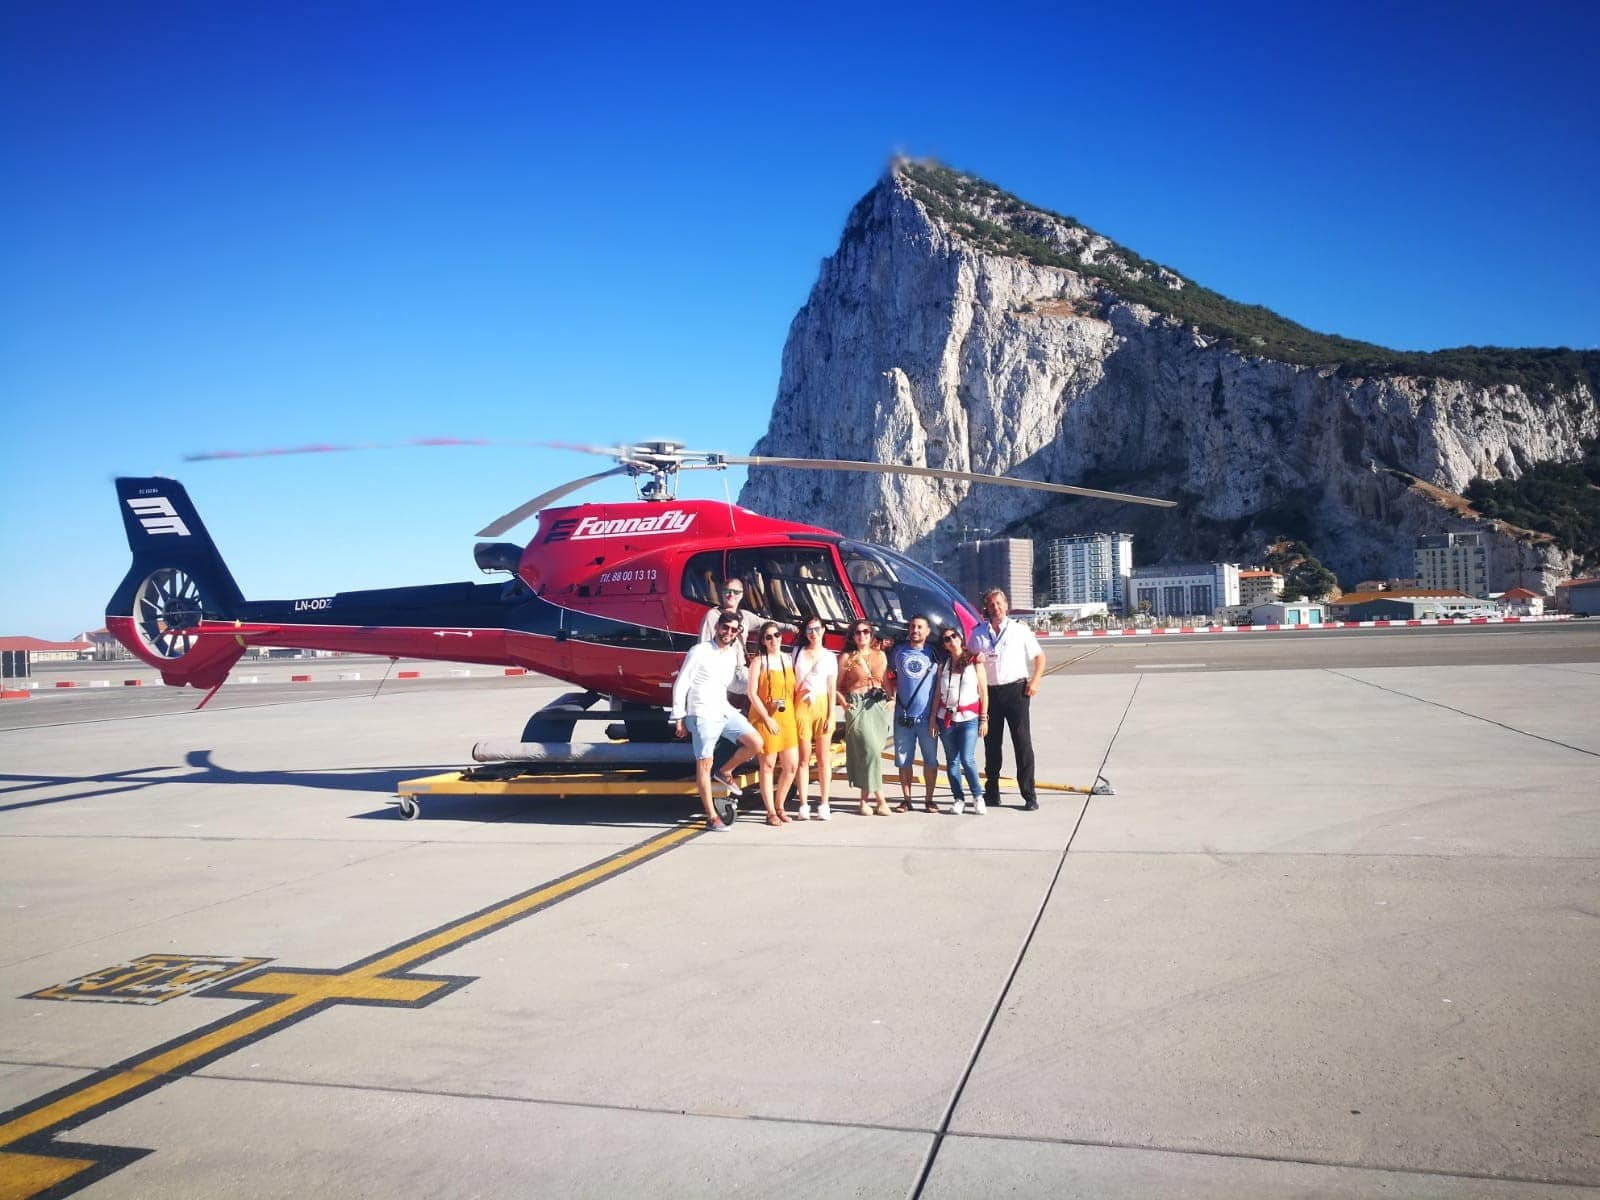 23-jun-2019-blogueros-espaoles-de-viajes-visitan-el-pen_48114462606_o